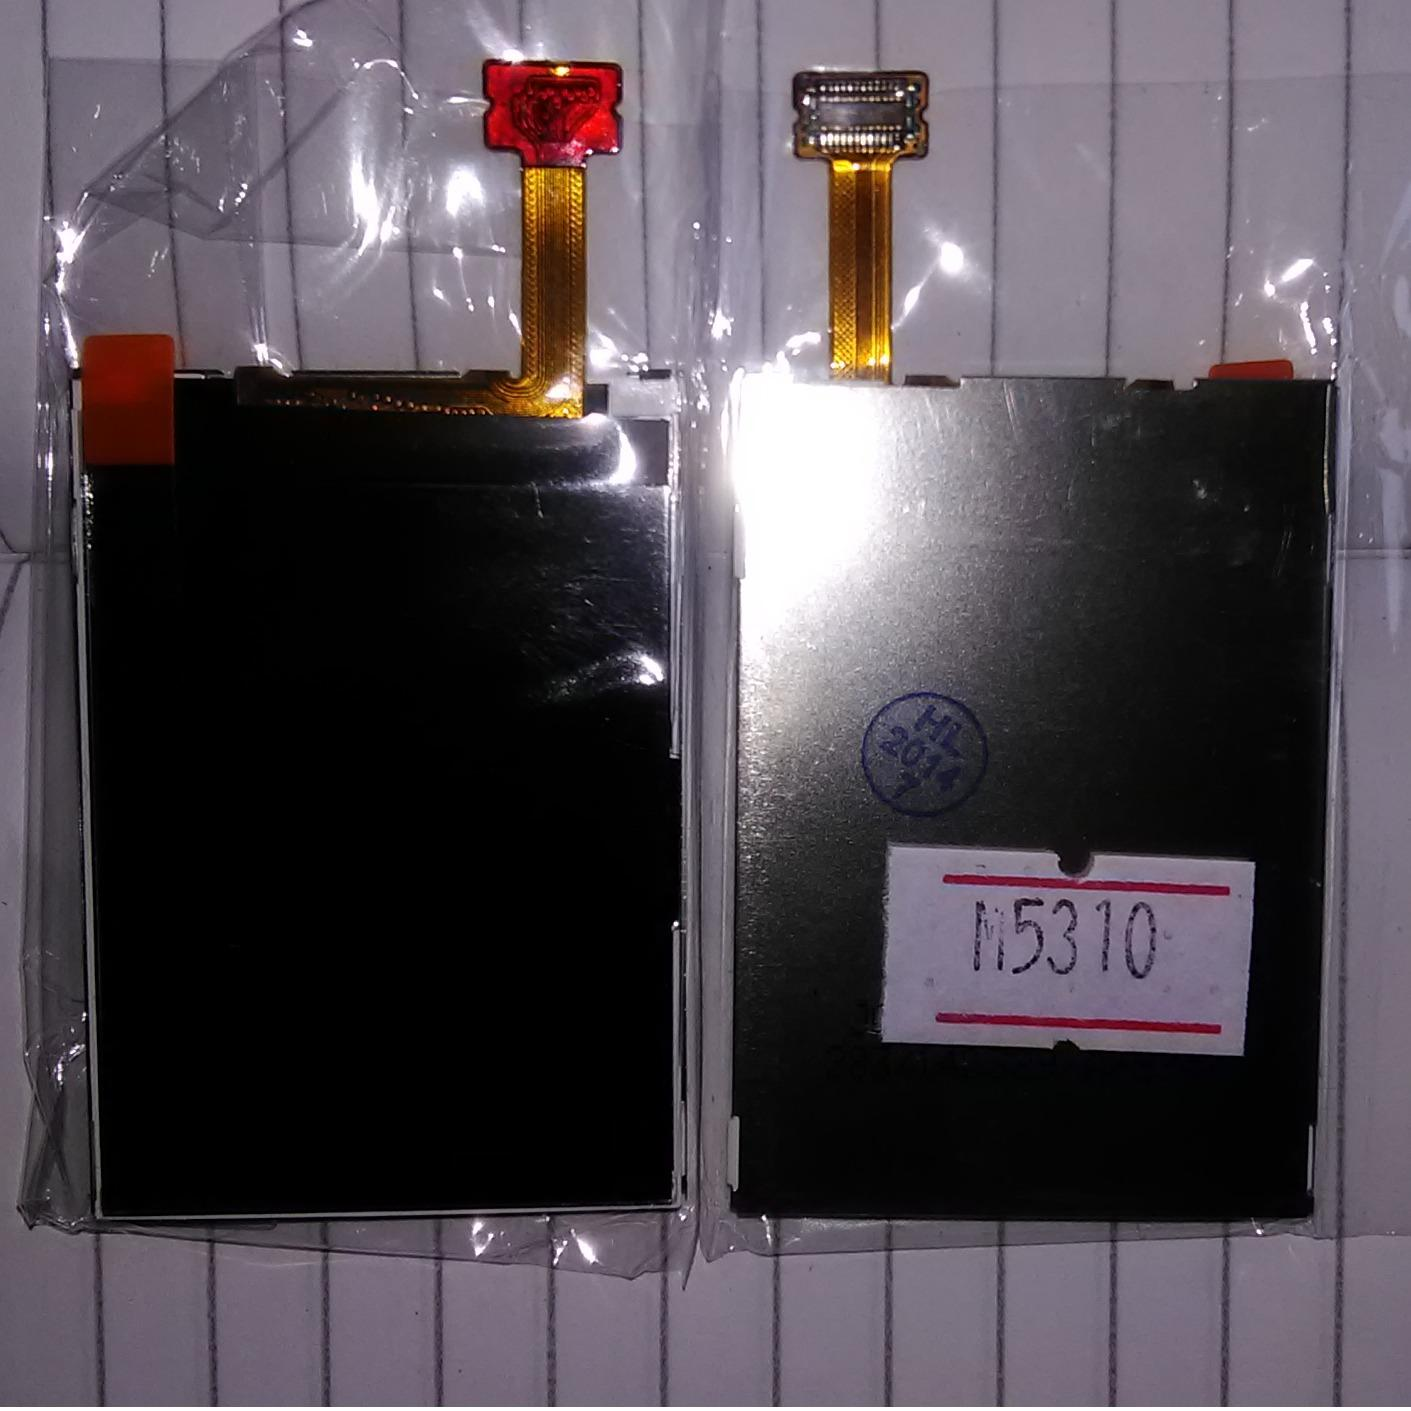 LCD / Layar Display Nokia 5310 3210C 3600S 5320 6120C 6300 6350 6500C 6555 7500 8600 E51